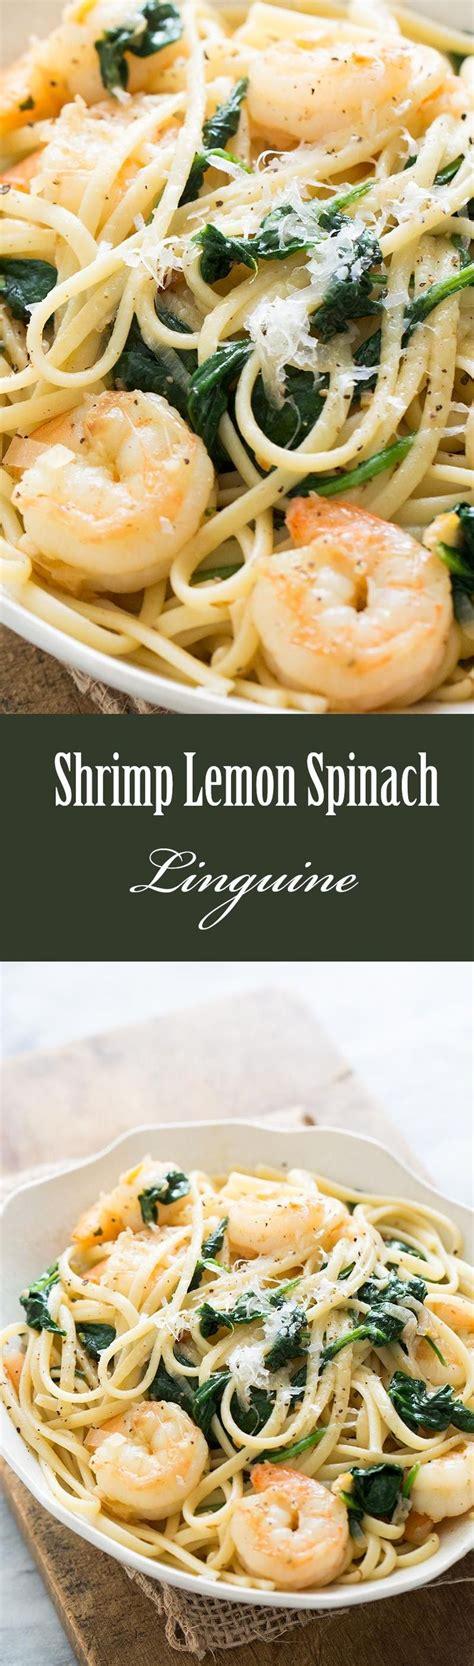 ina garten spinach best 25 shrimp linguine ideas on pinterest seafood linguine shrimp linguini alfredo and